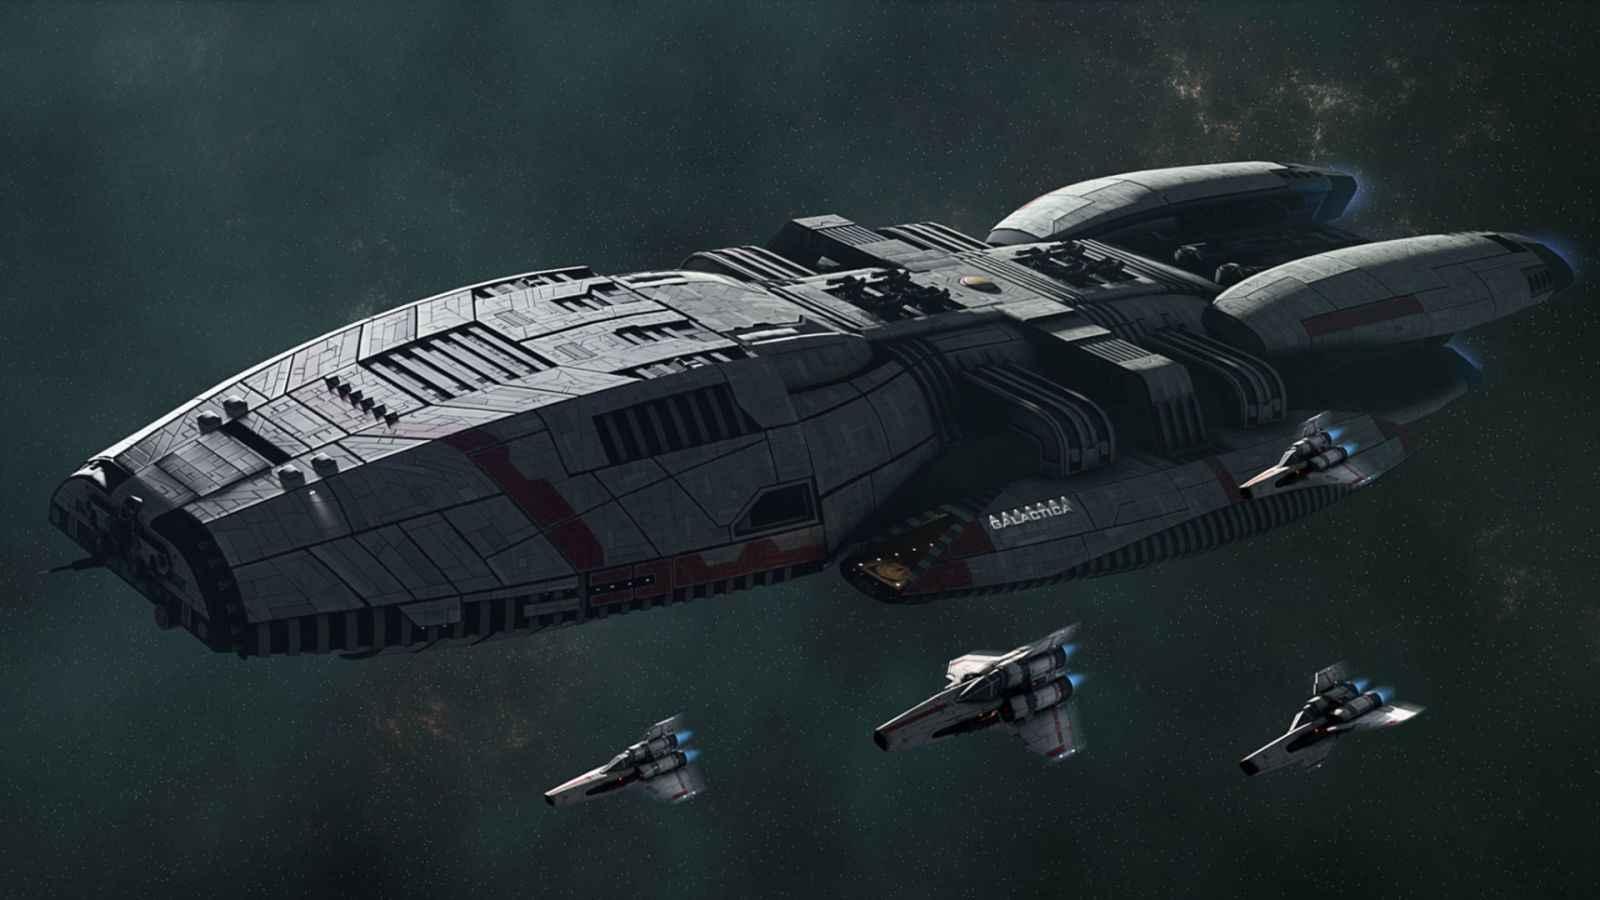 Wallpaper Falling Skies Battlestar Galactica Deadlock Release Date Set For